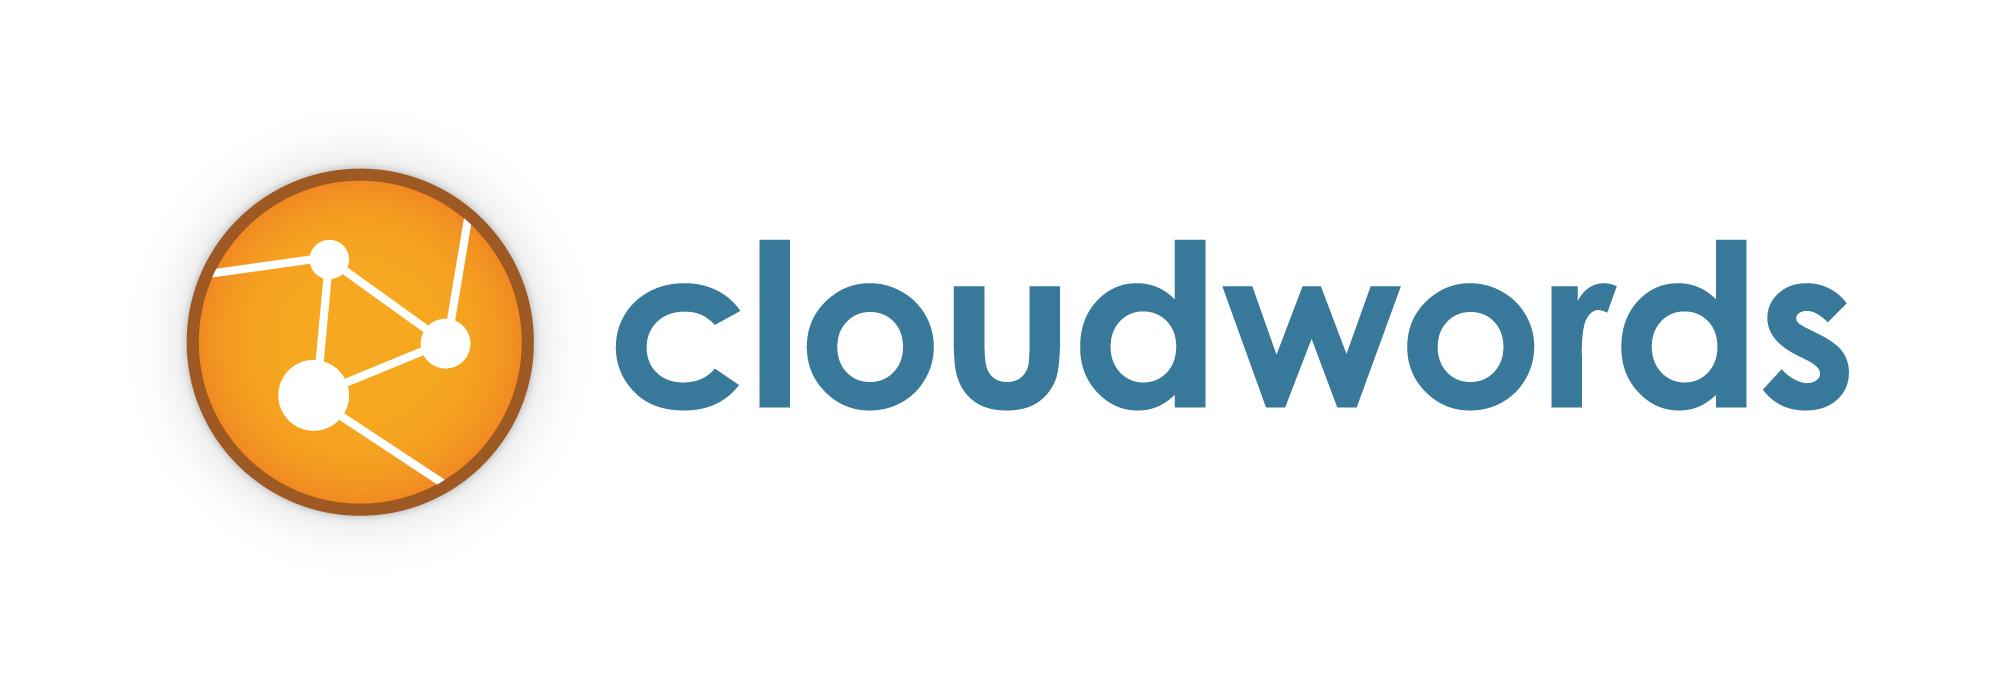 cloudwords-logo